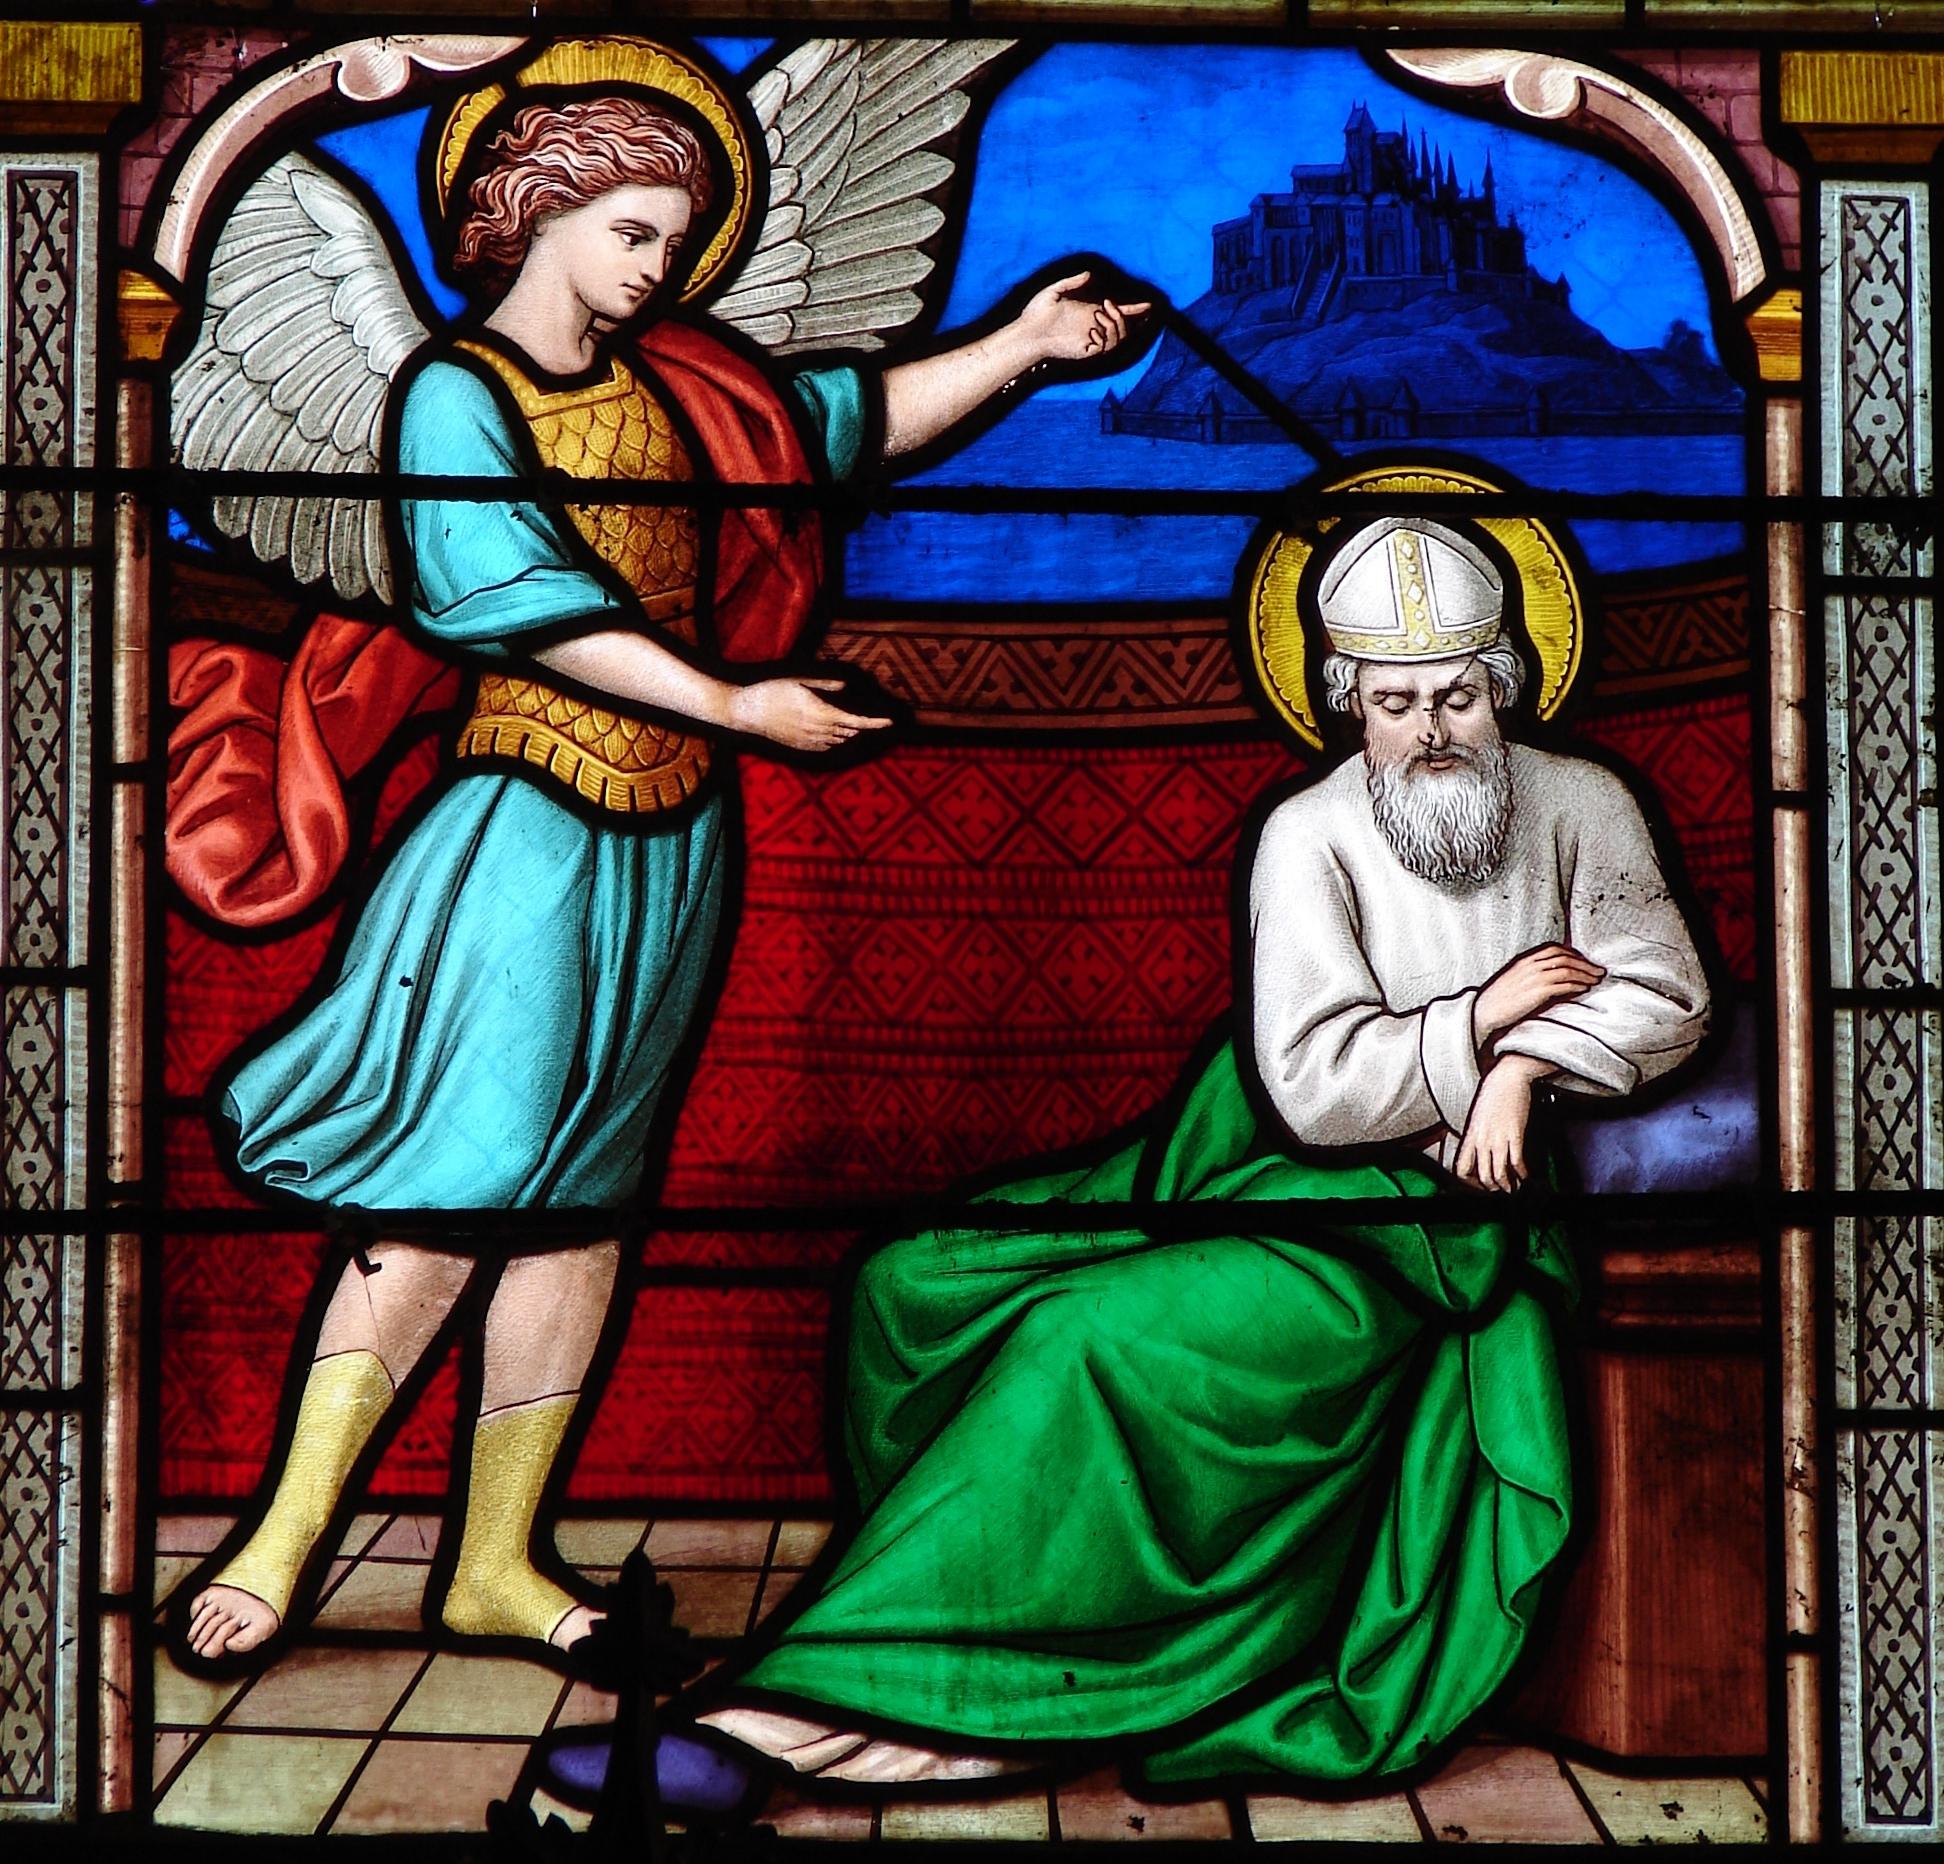 CALENDRIER CATHOLIQUE 2019 (Cantiques, Prières & Images) - Page 8 St-michel-appara-...nt-tombe-568d706